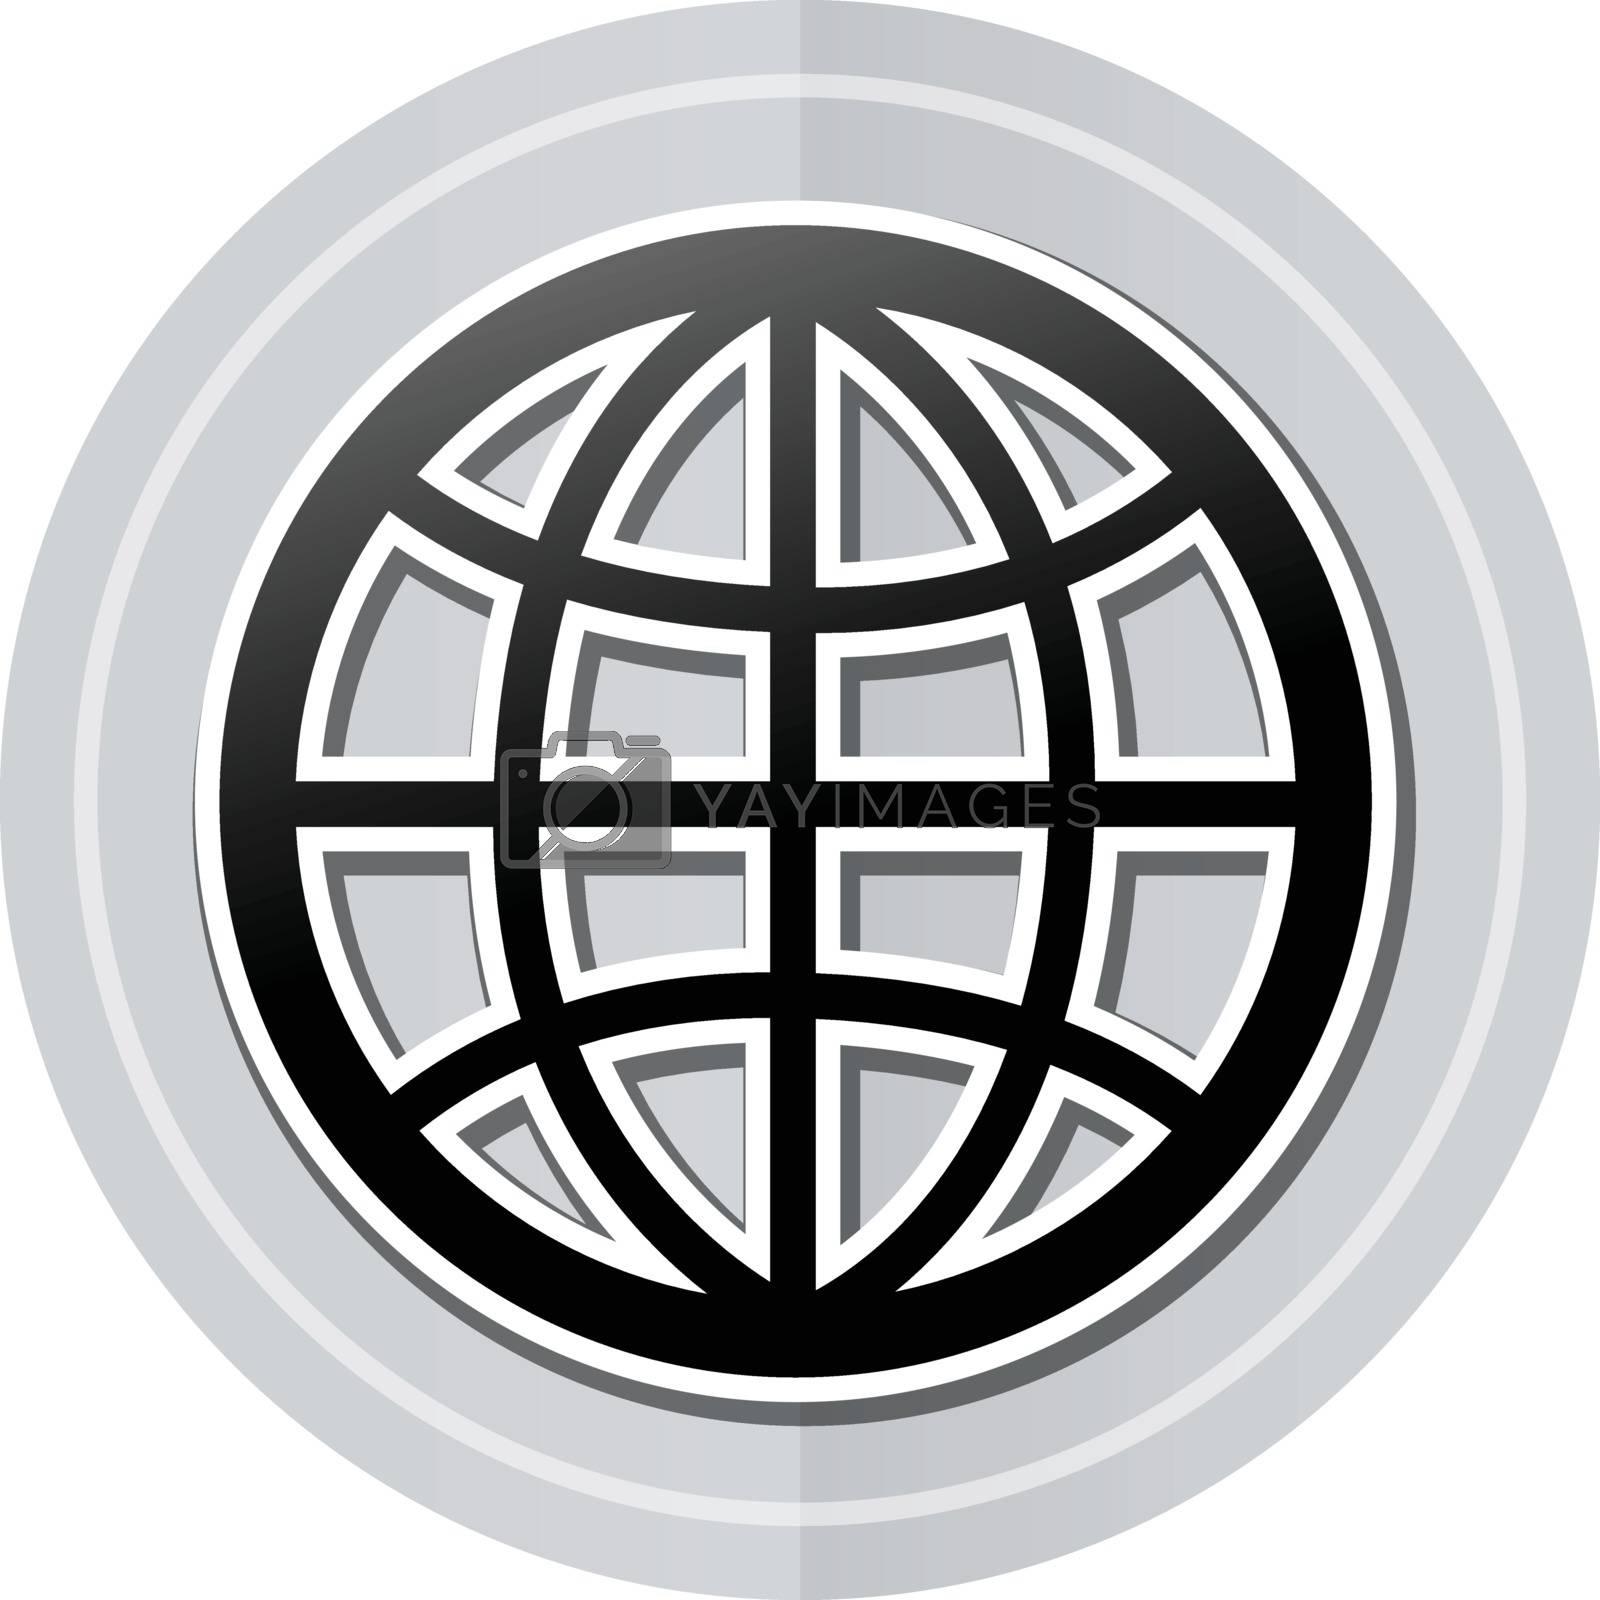 Illustration of globe sticker icon simple design